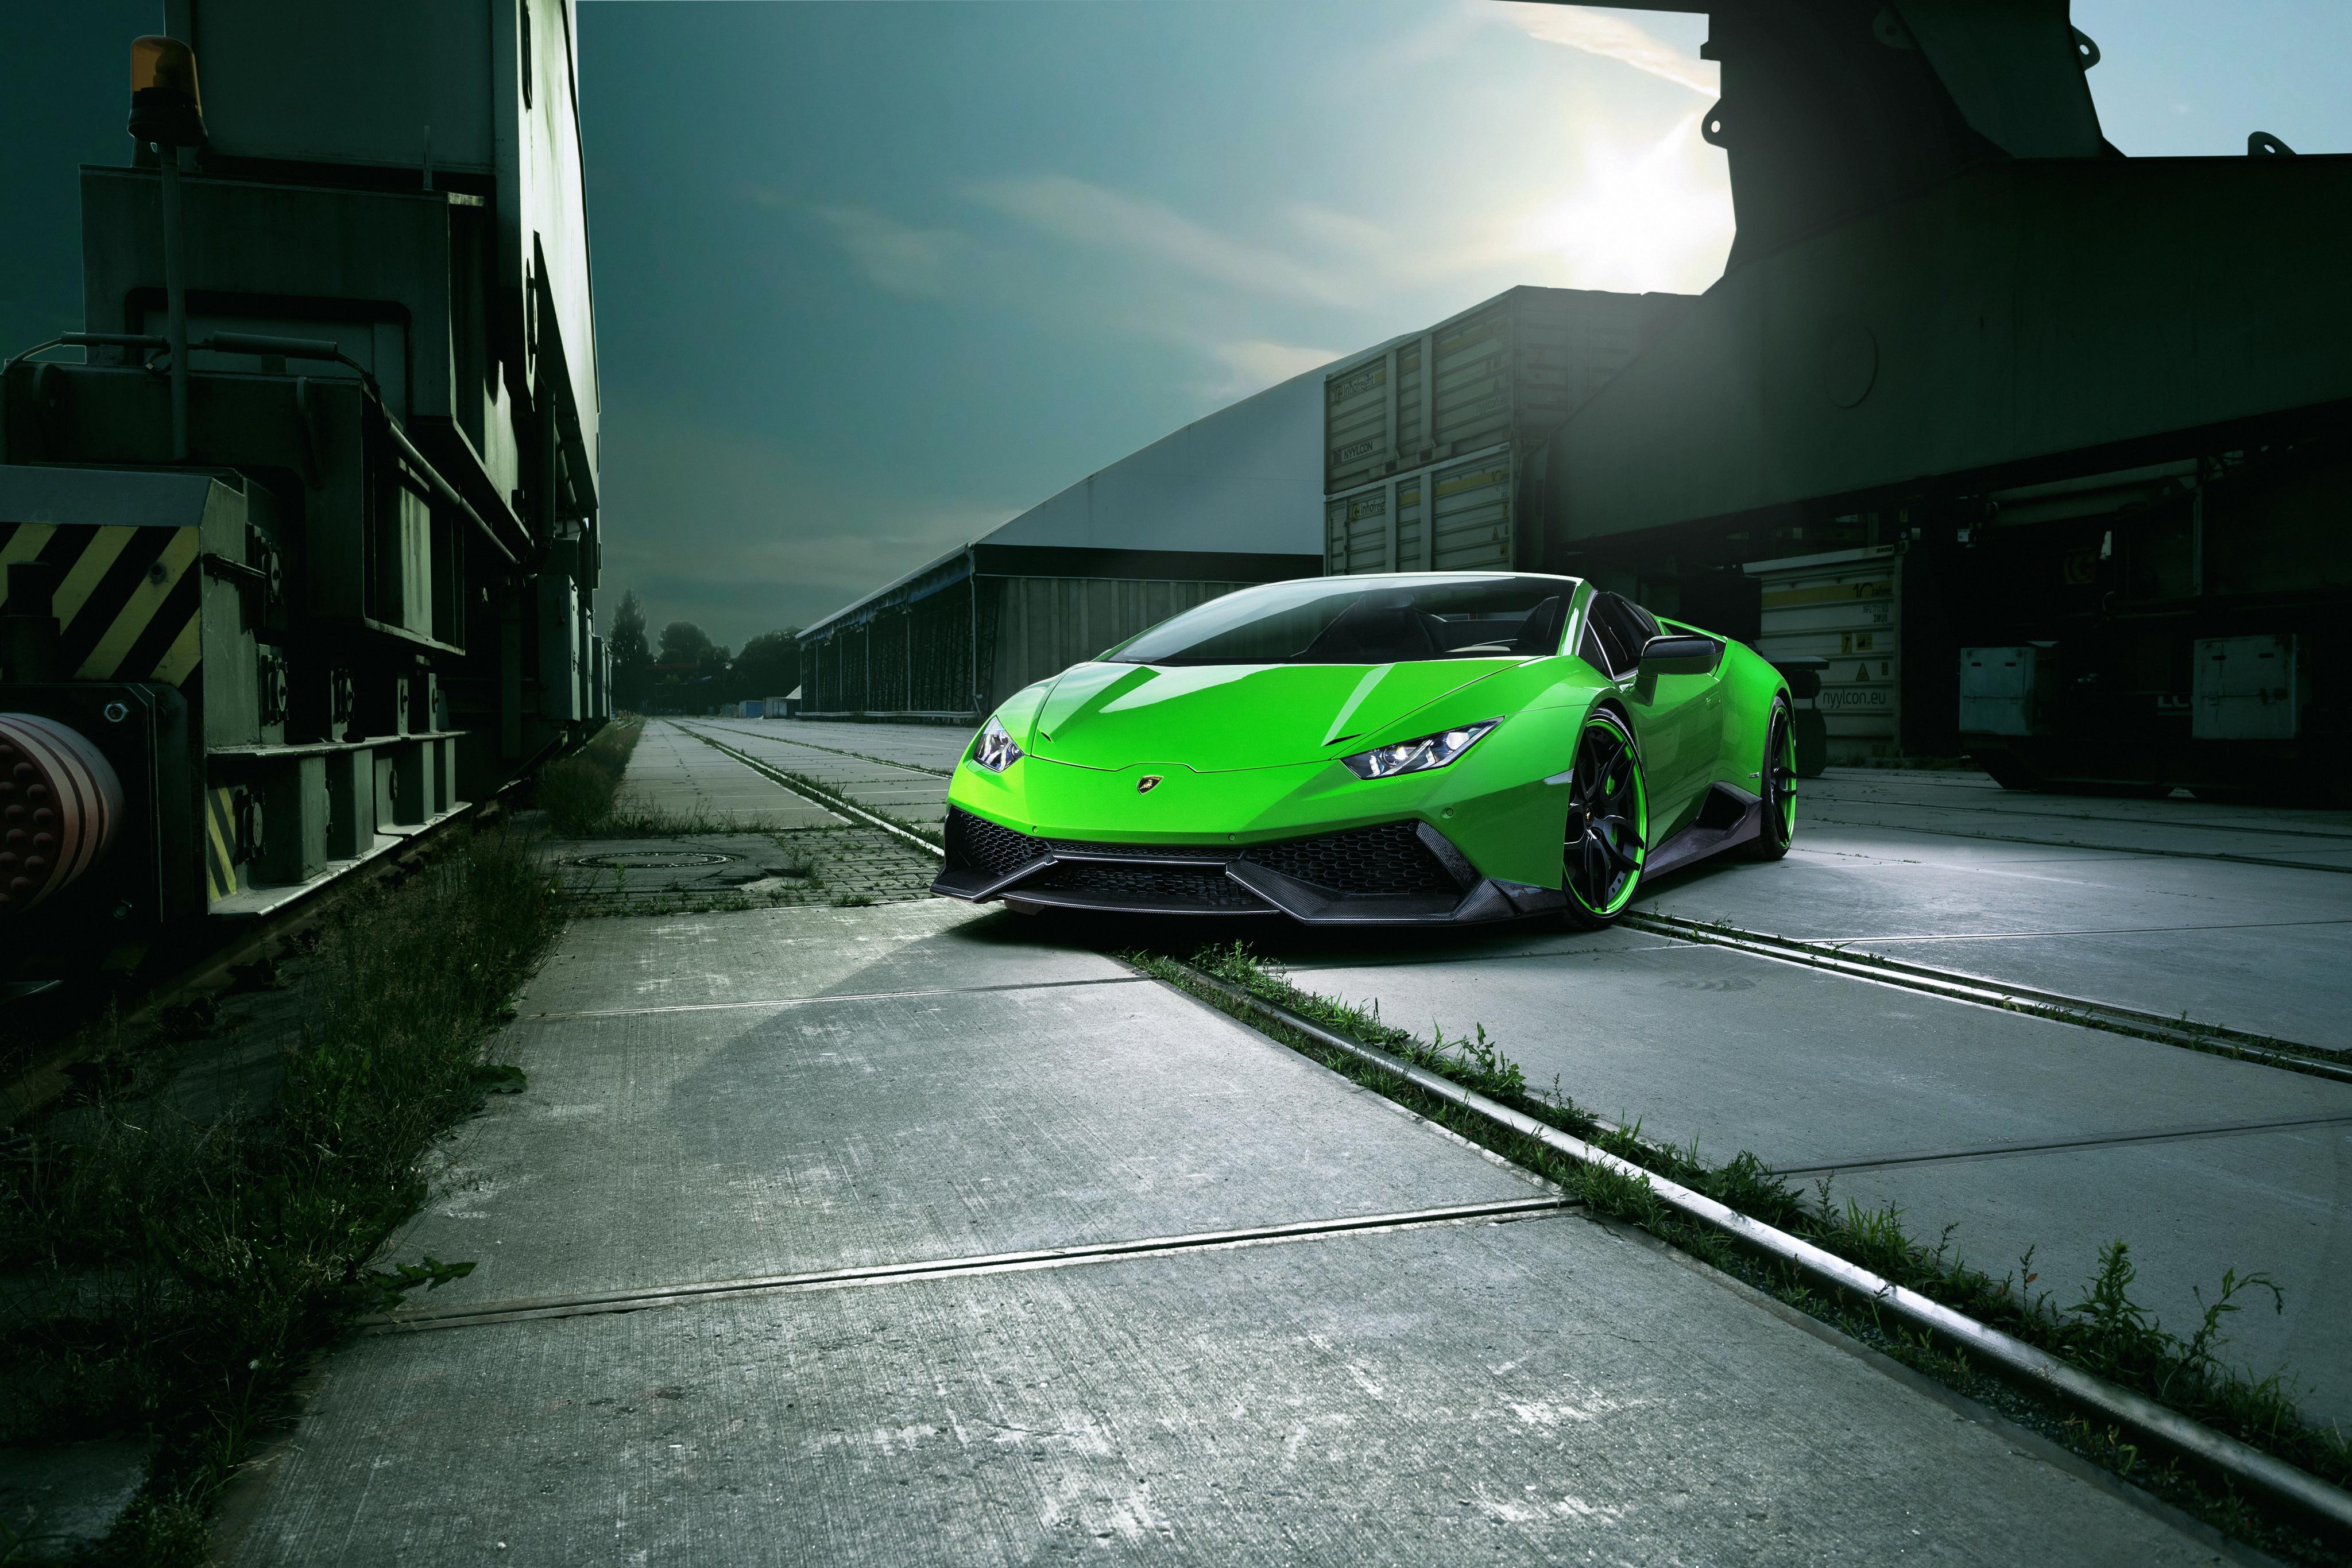 144082 Заставки и Обои Вид Спереди на телефон. Скачать Ламборджини (Lamborghini), Вид Спереди, Тачки (Cars), Зеленый, Huracan, Spyder картинки бесплатно